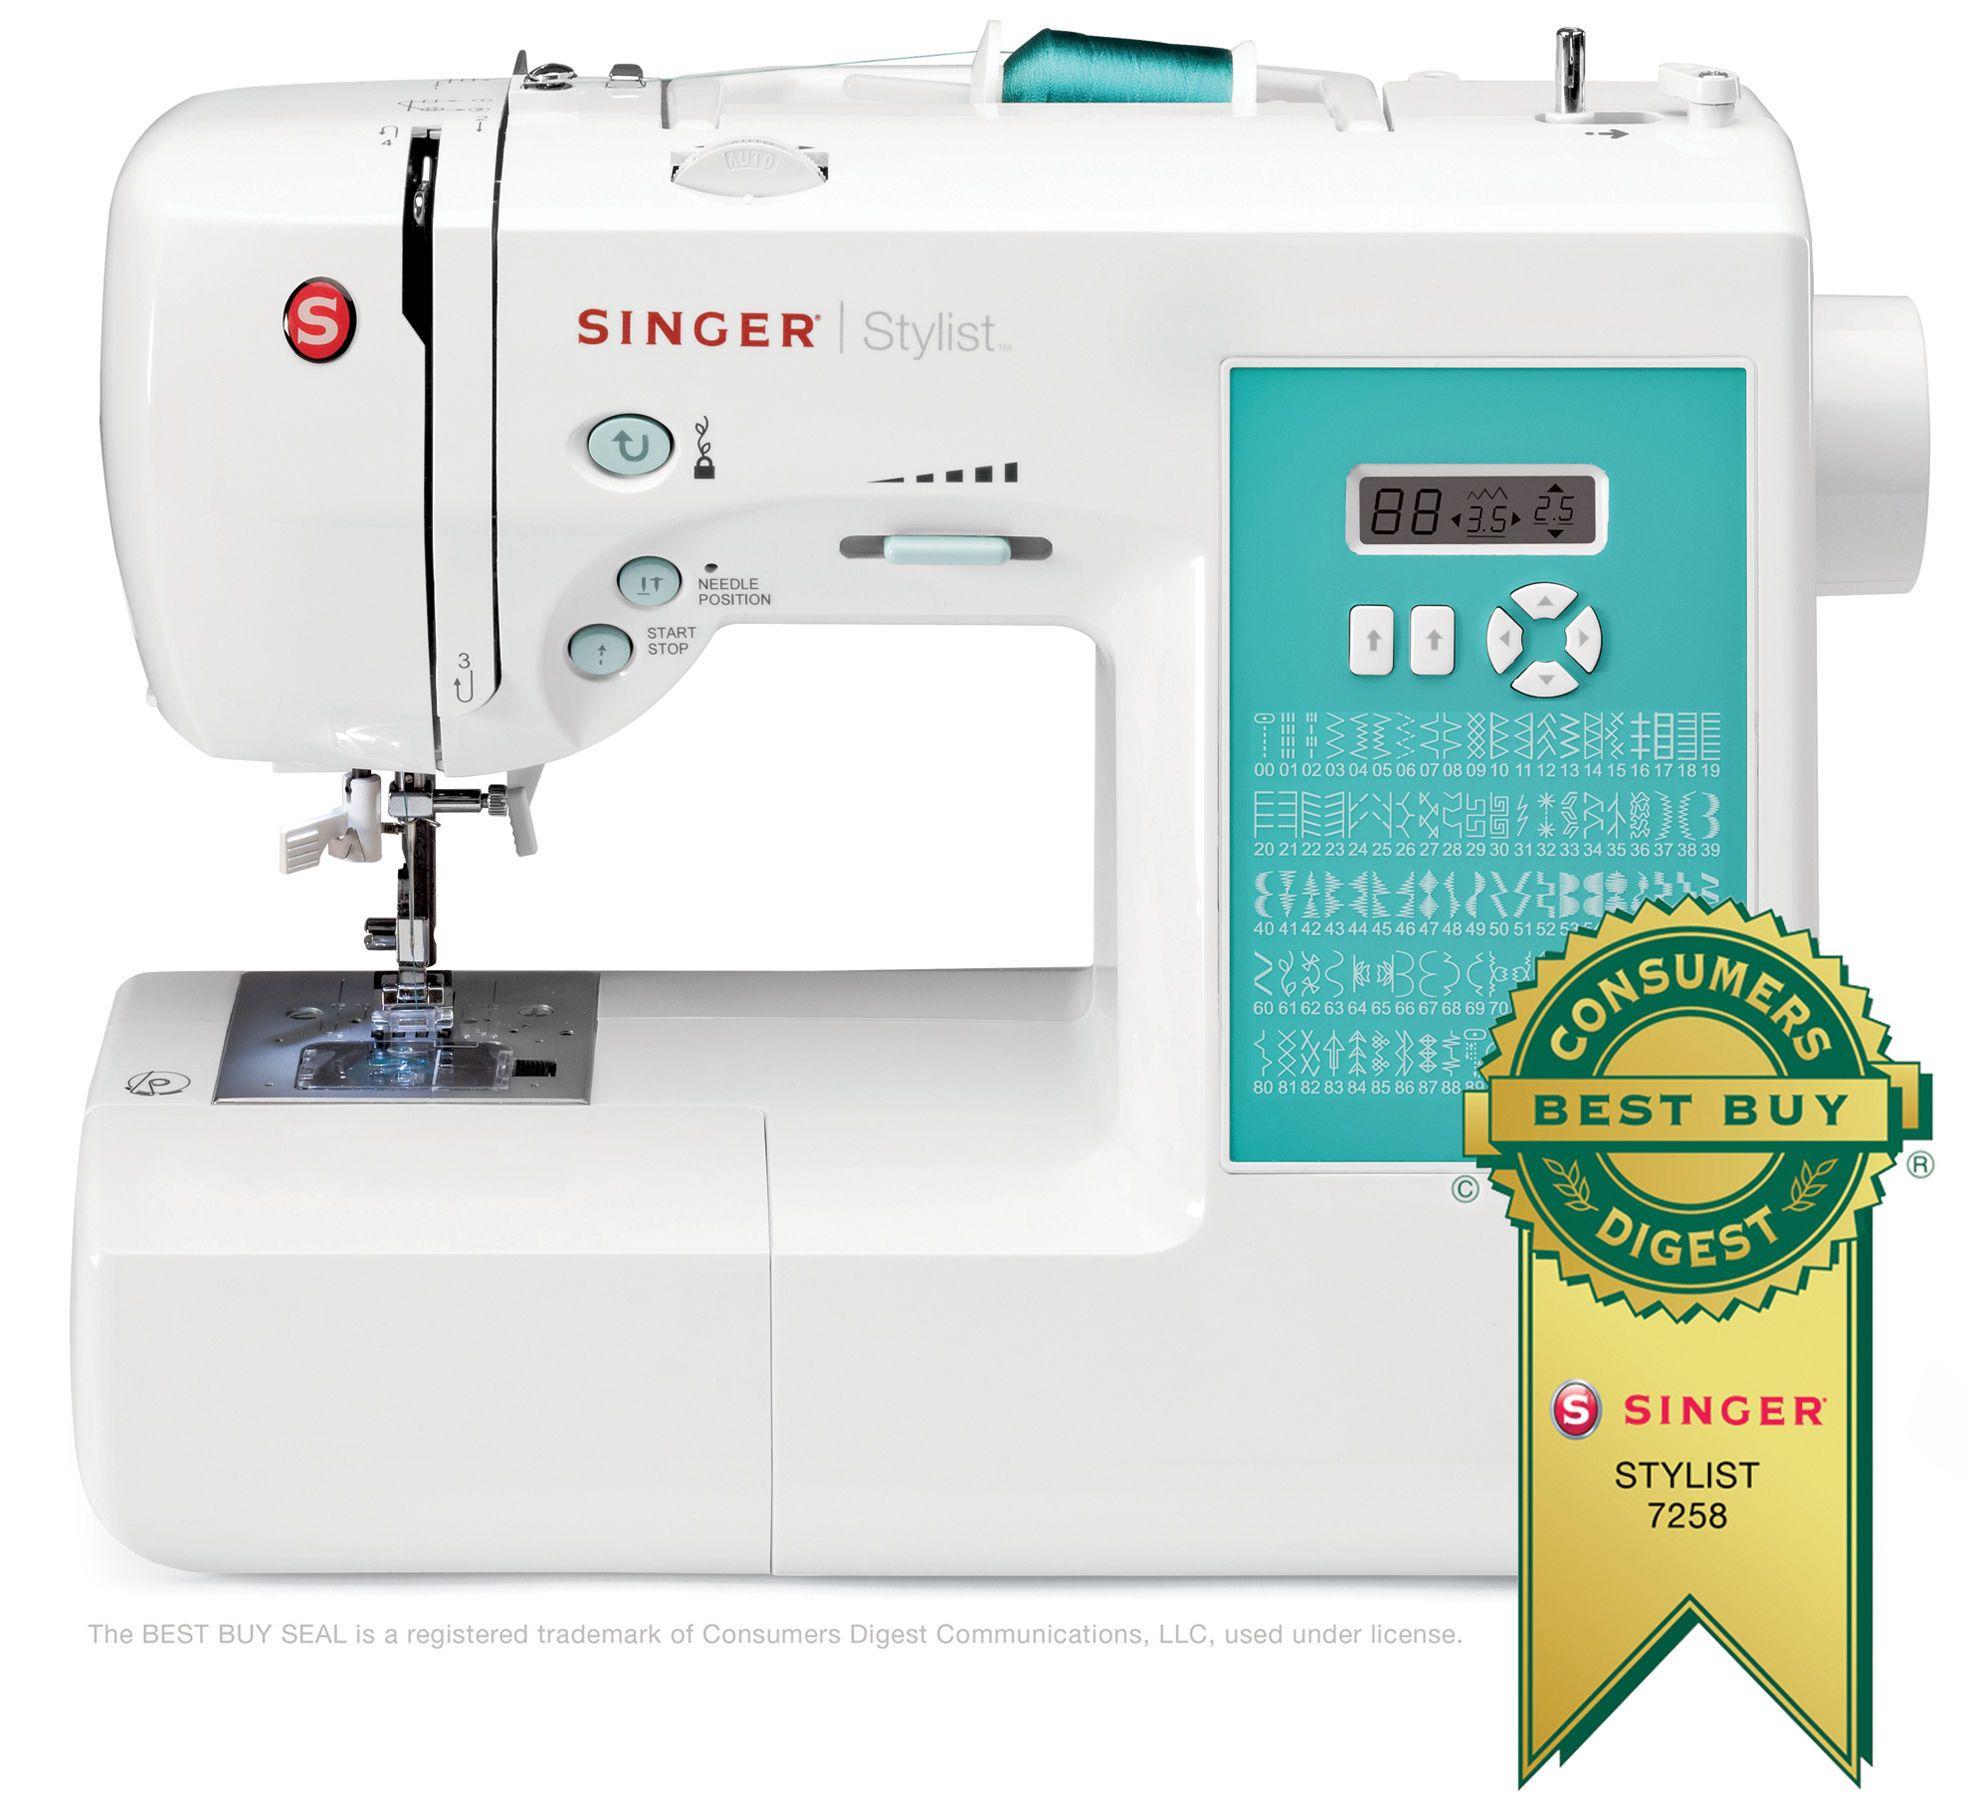 Singer 7258 Stylist Award - Winning Electronic Sewing Machine